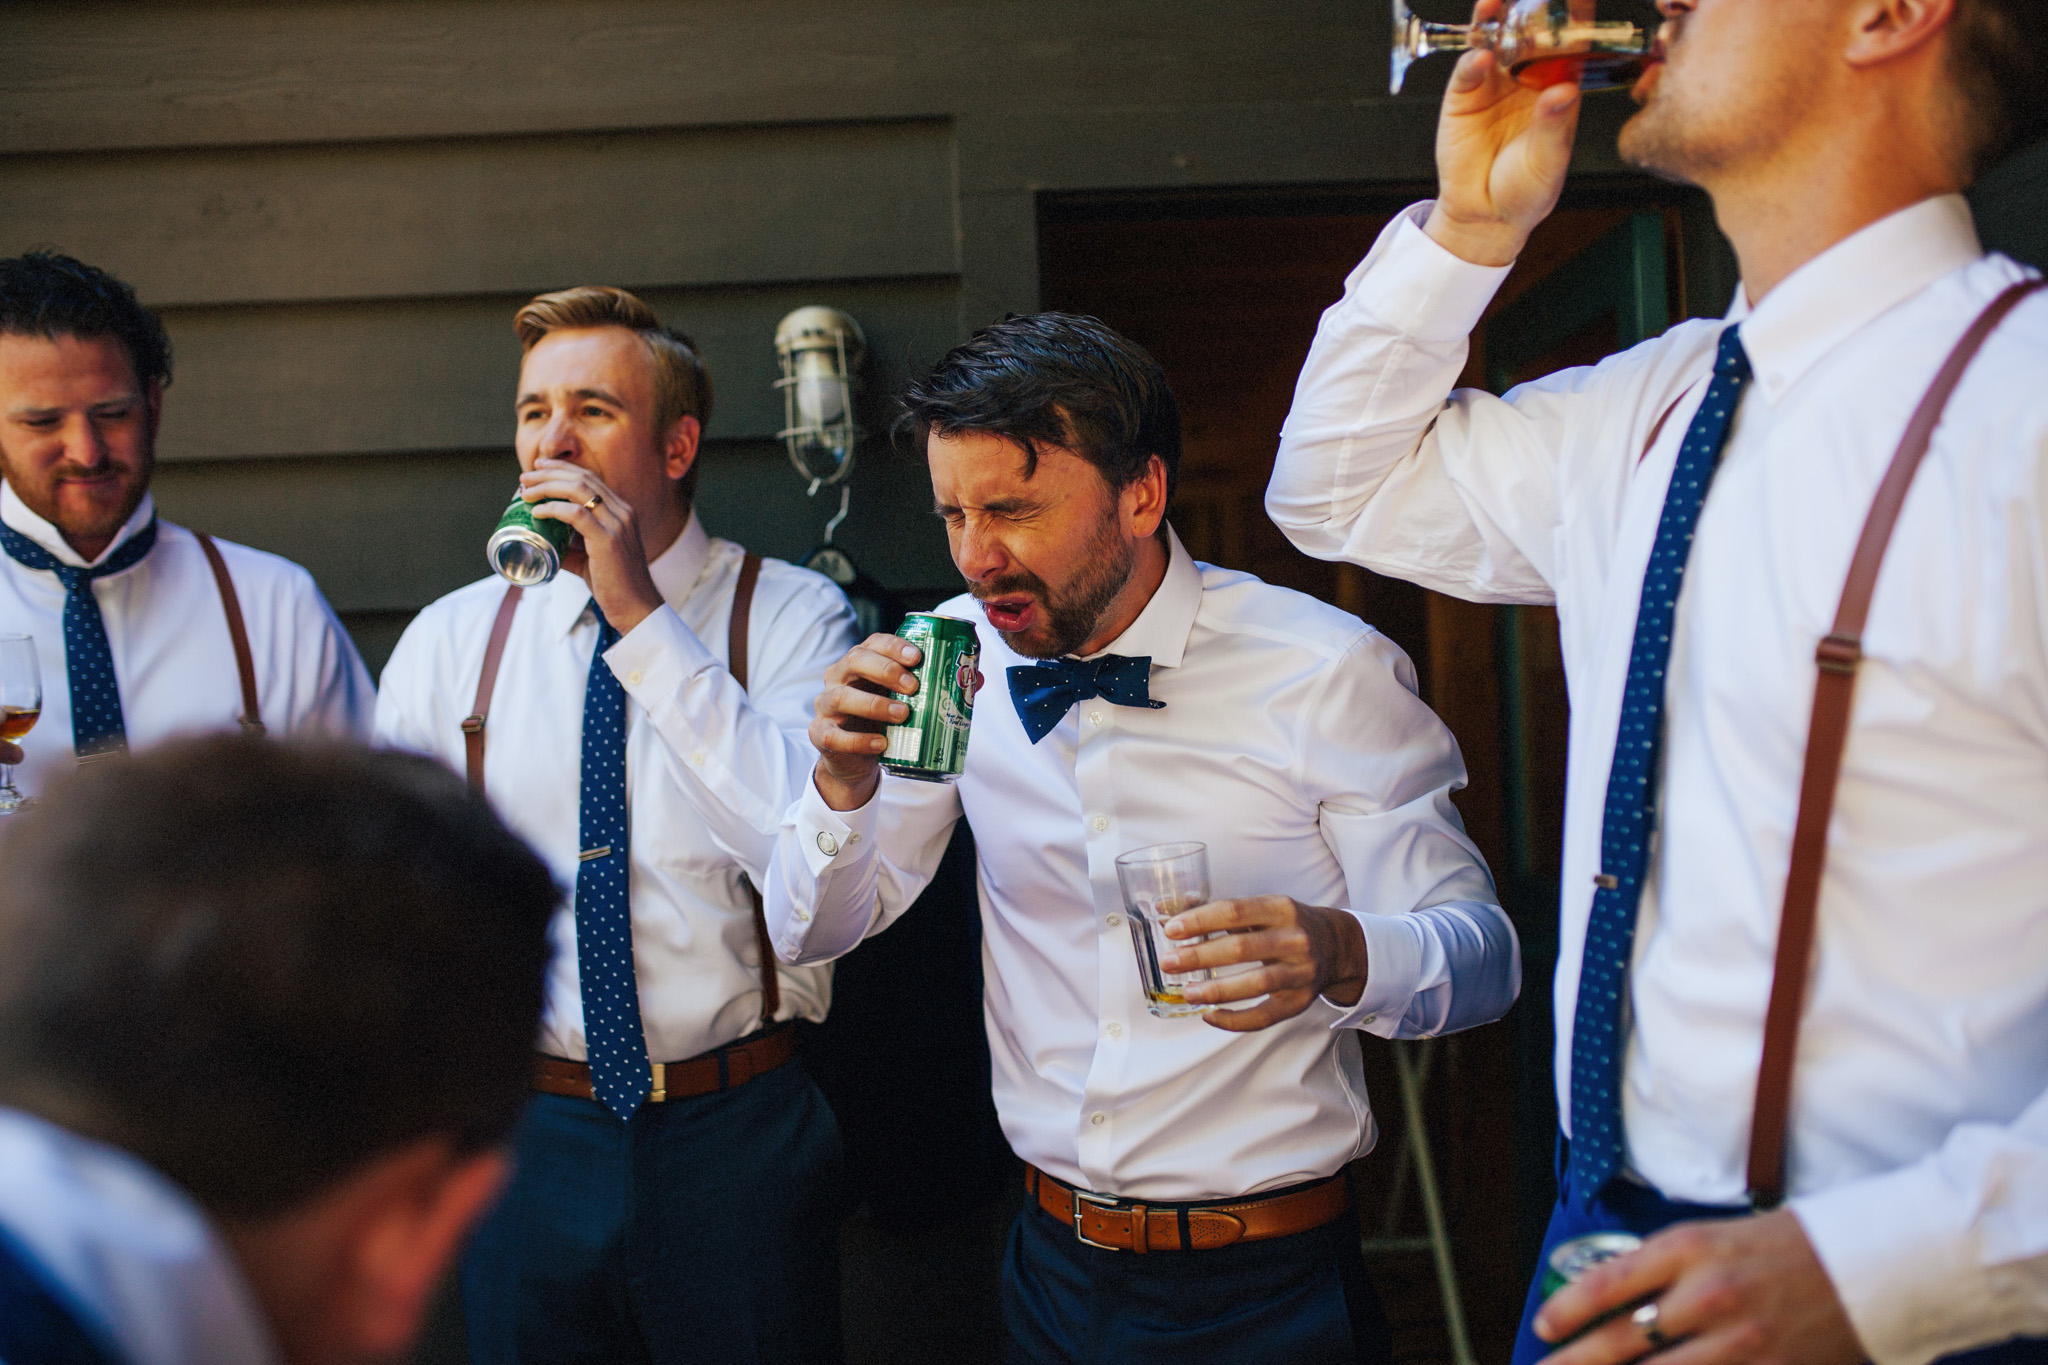 Groomsmen Getting Ready | Wedding Day Prep